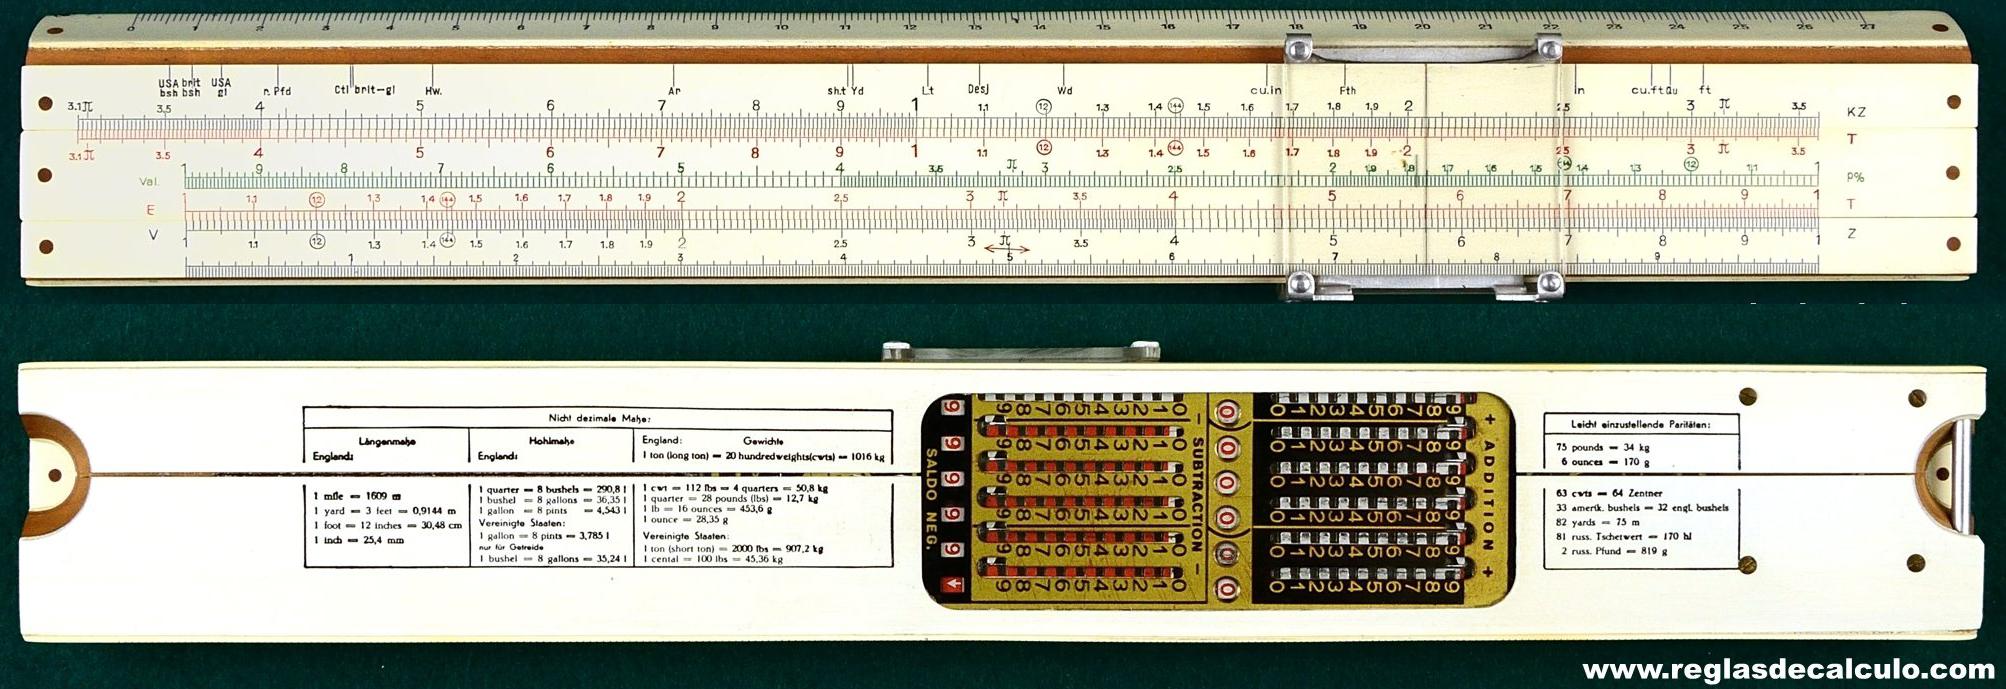 British pre-decimal £sd bottom edge scales - conversion tables + addiator  on back